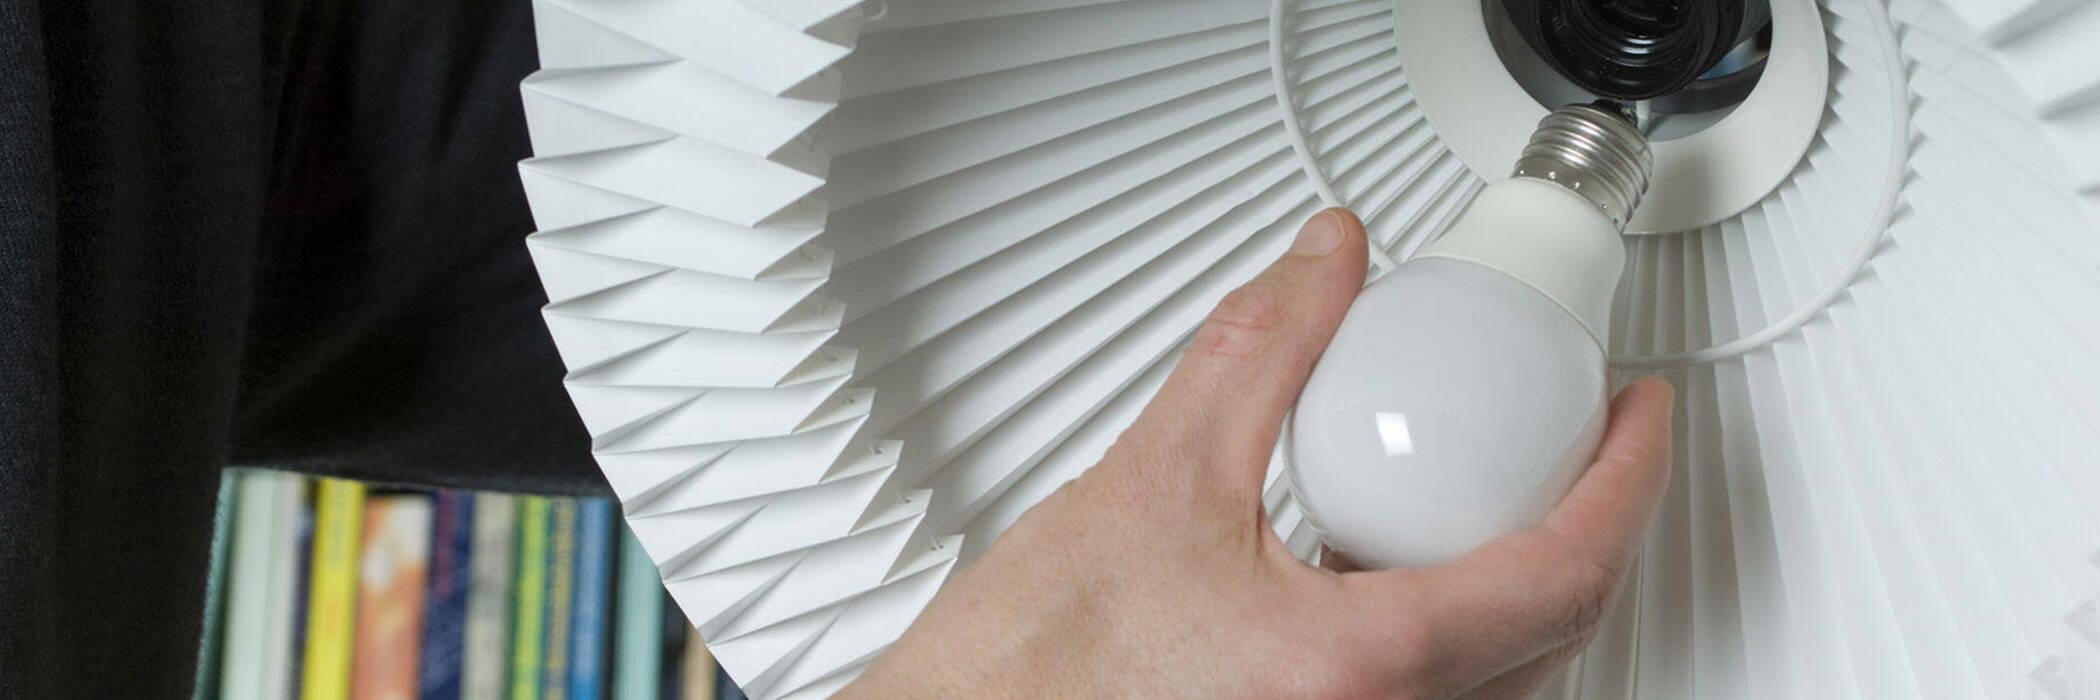 installing a lightbulb